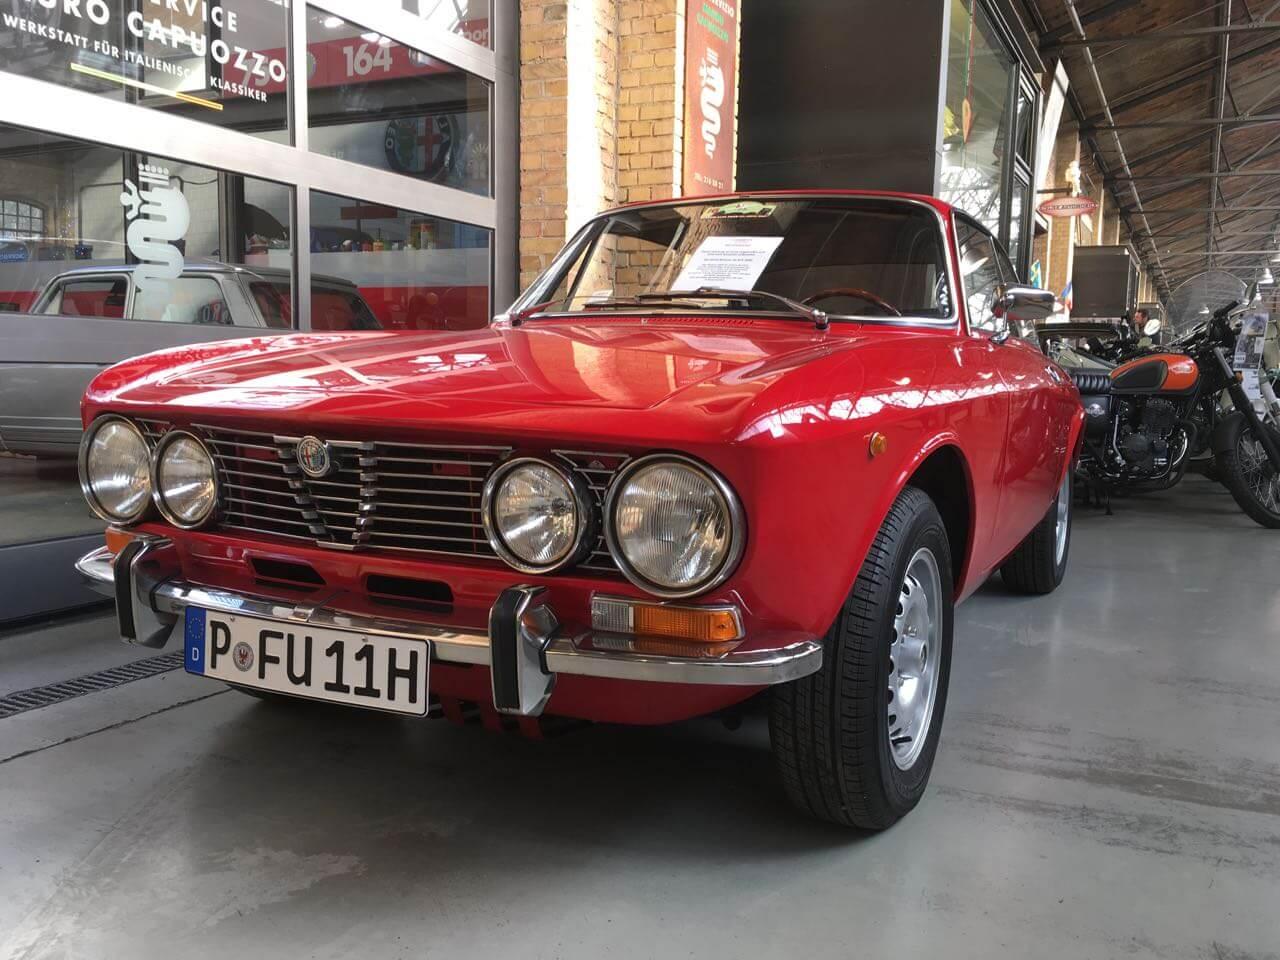 I like old Alfa's